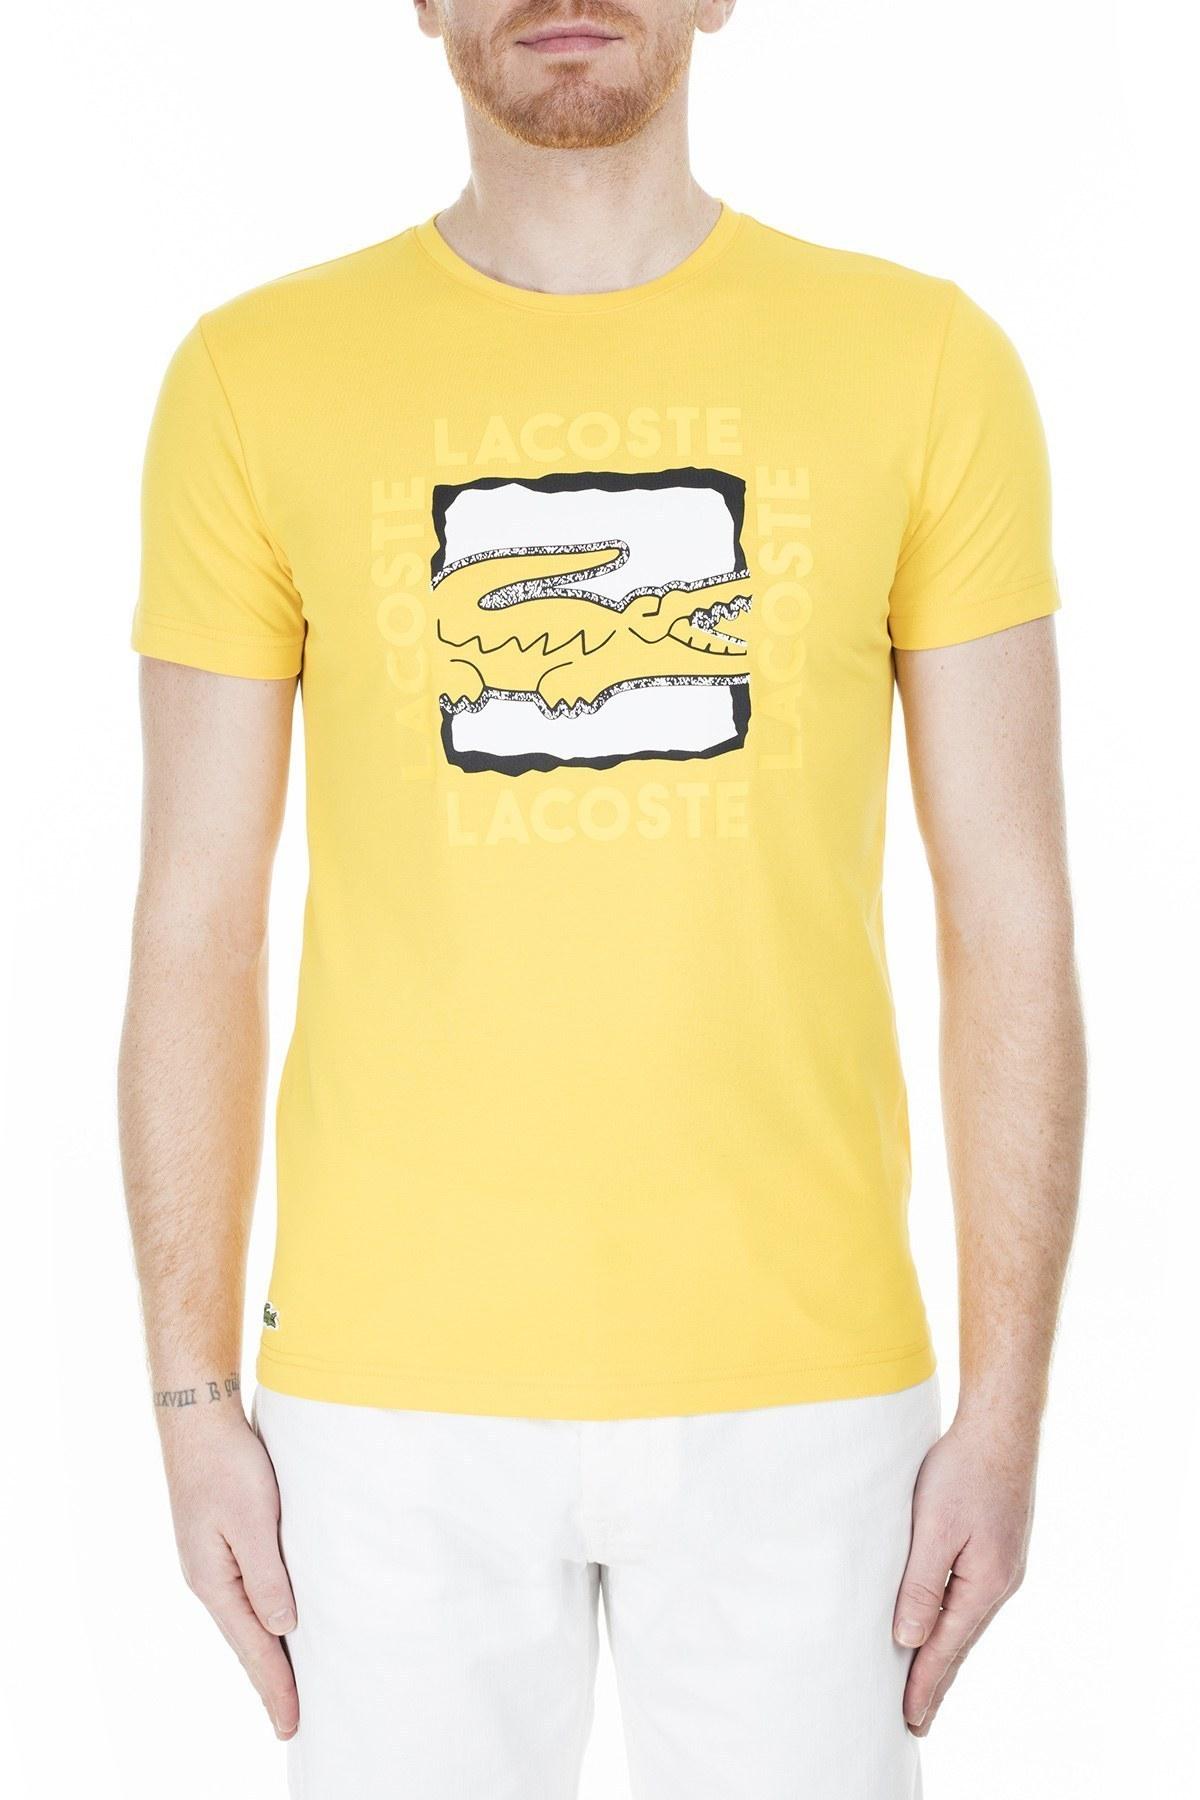 Lacoste Erkek T Shirt TH4887 RUZ SARI